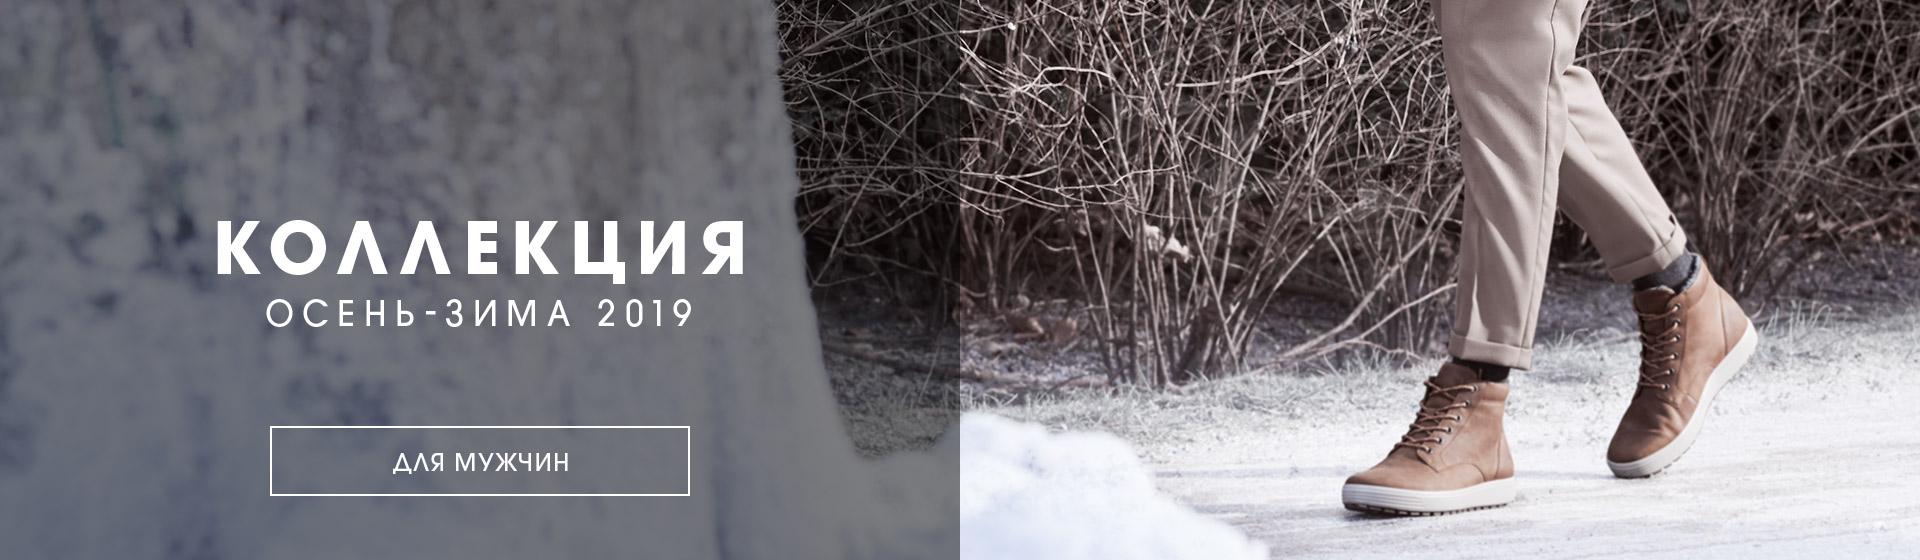 Коллекция осень-зима 2019 муж.